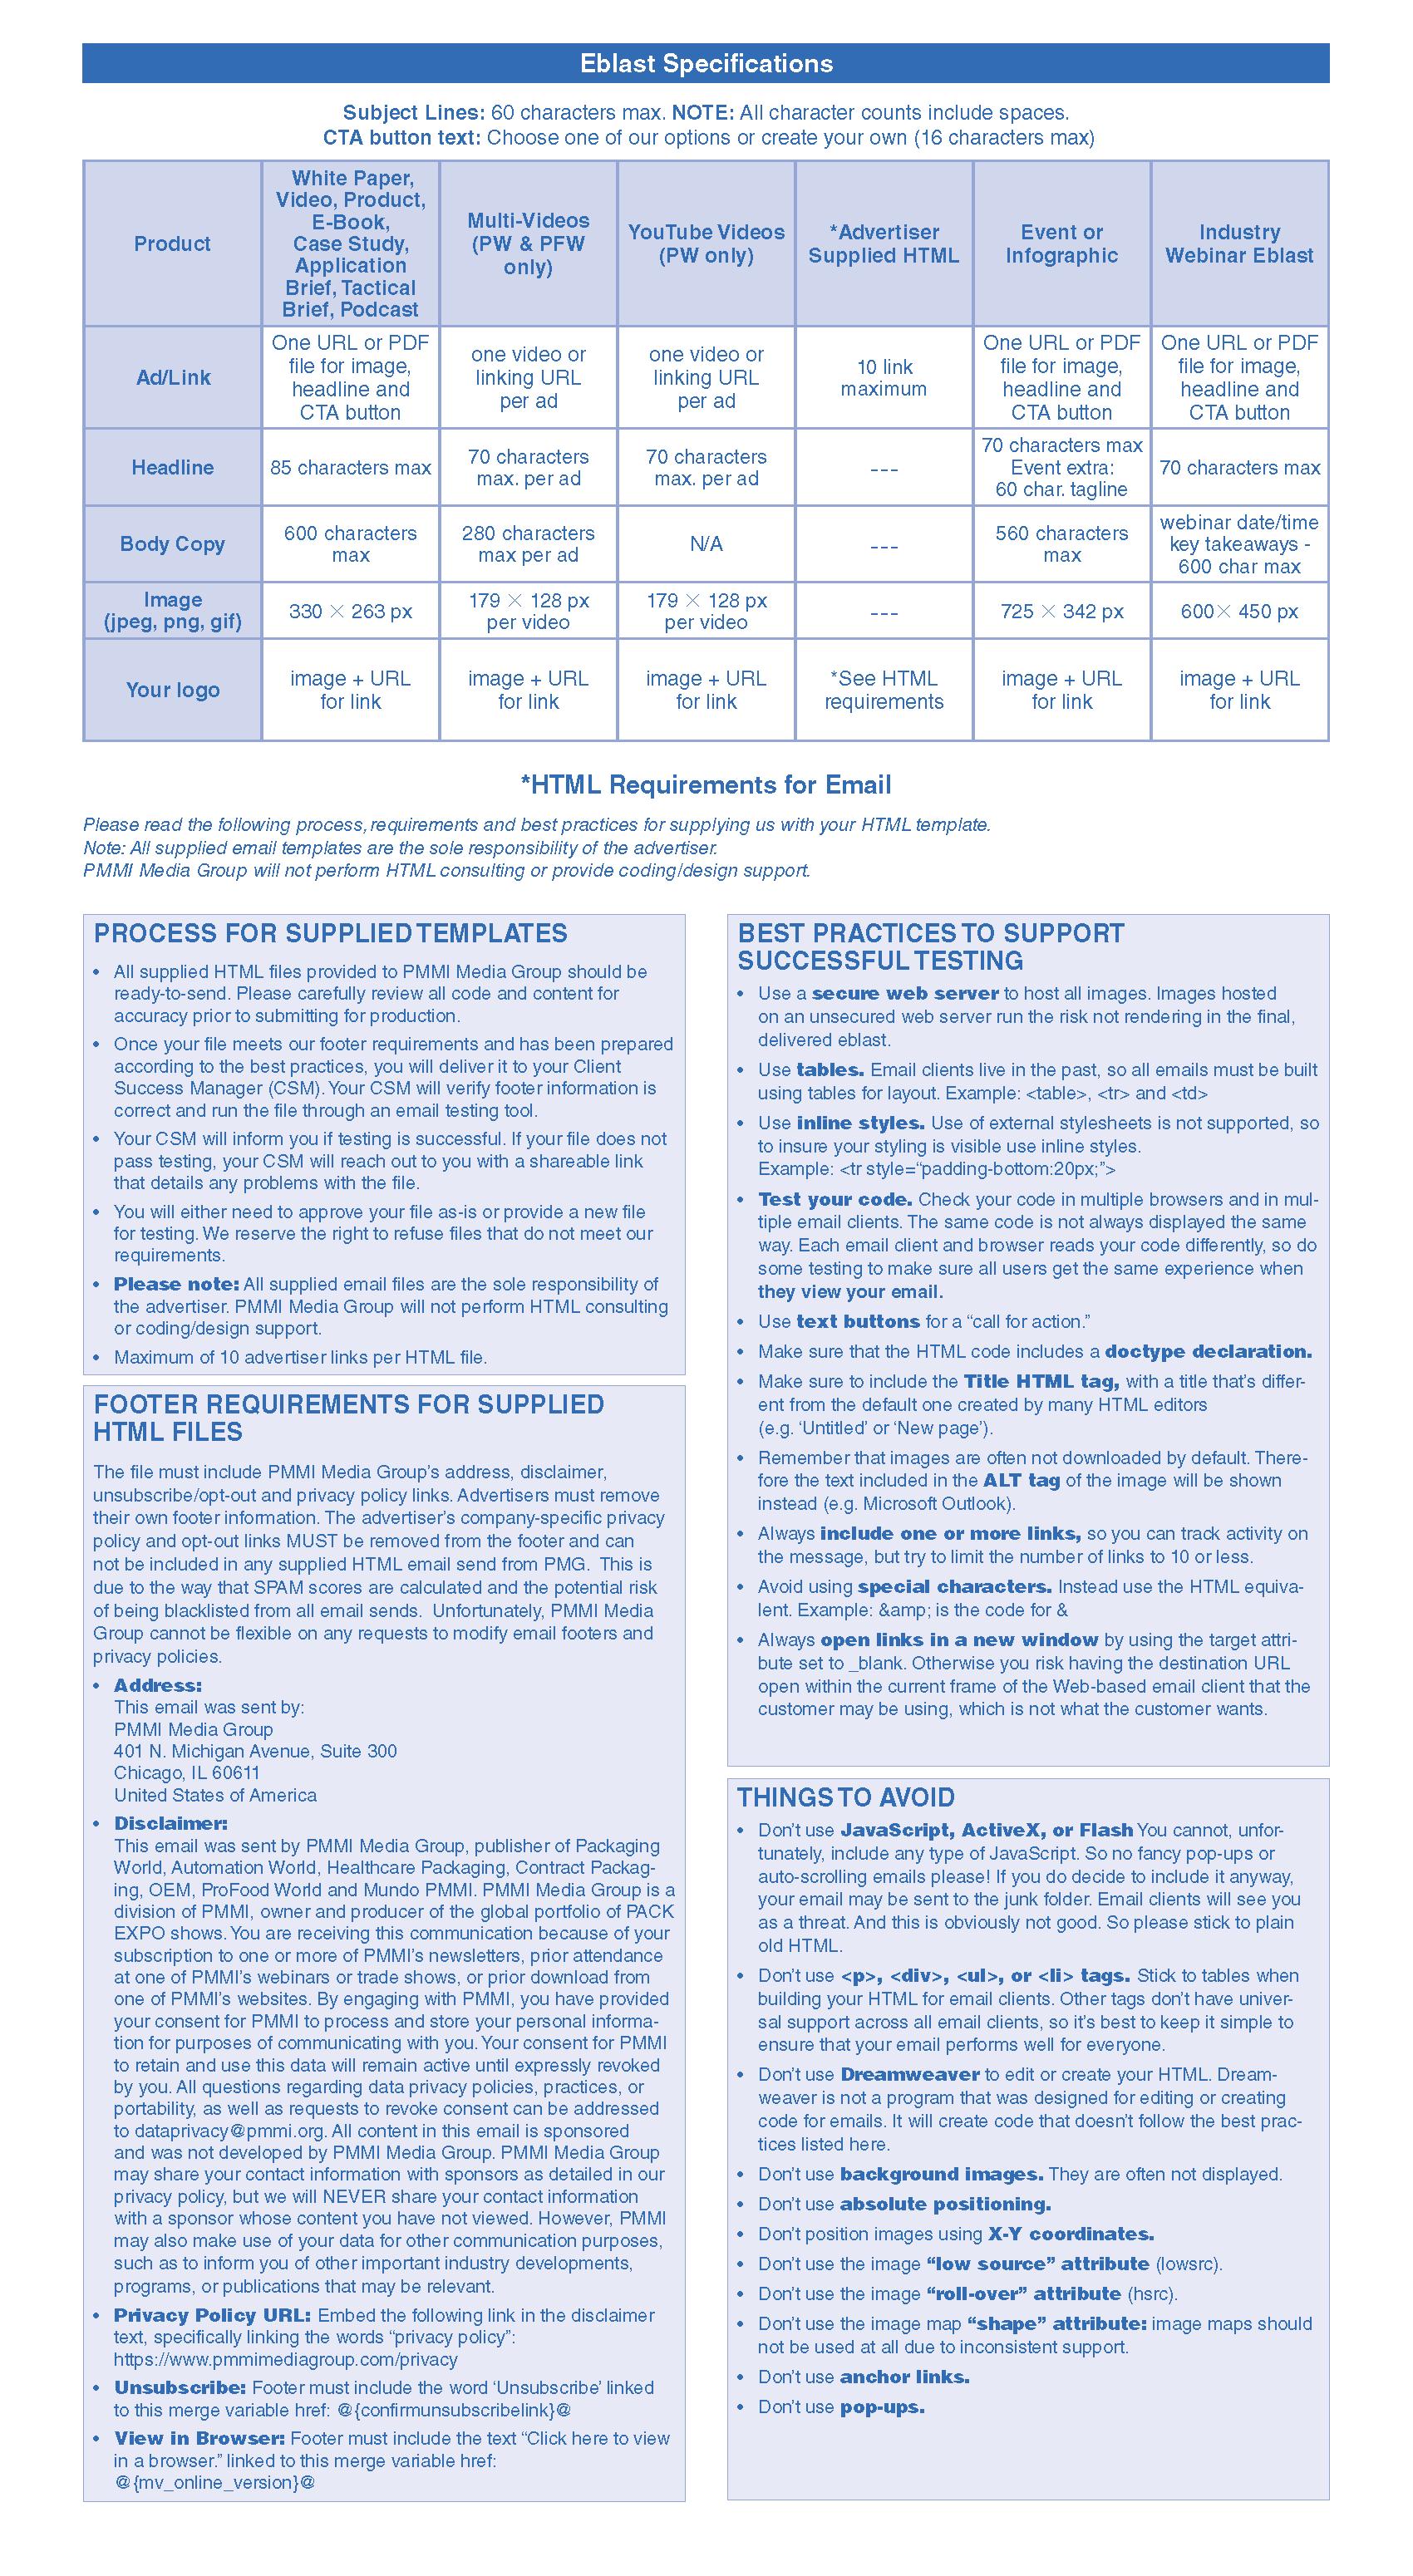 Eblast_Specs-V6.png